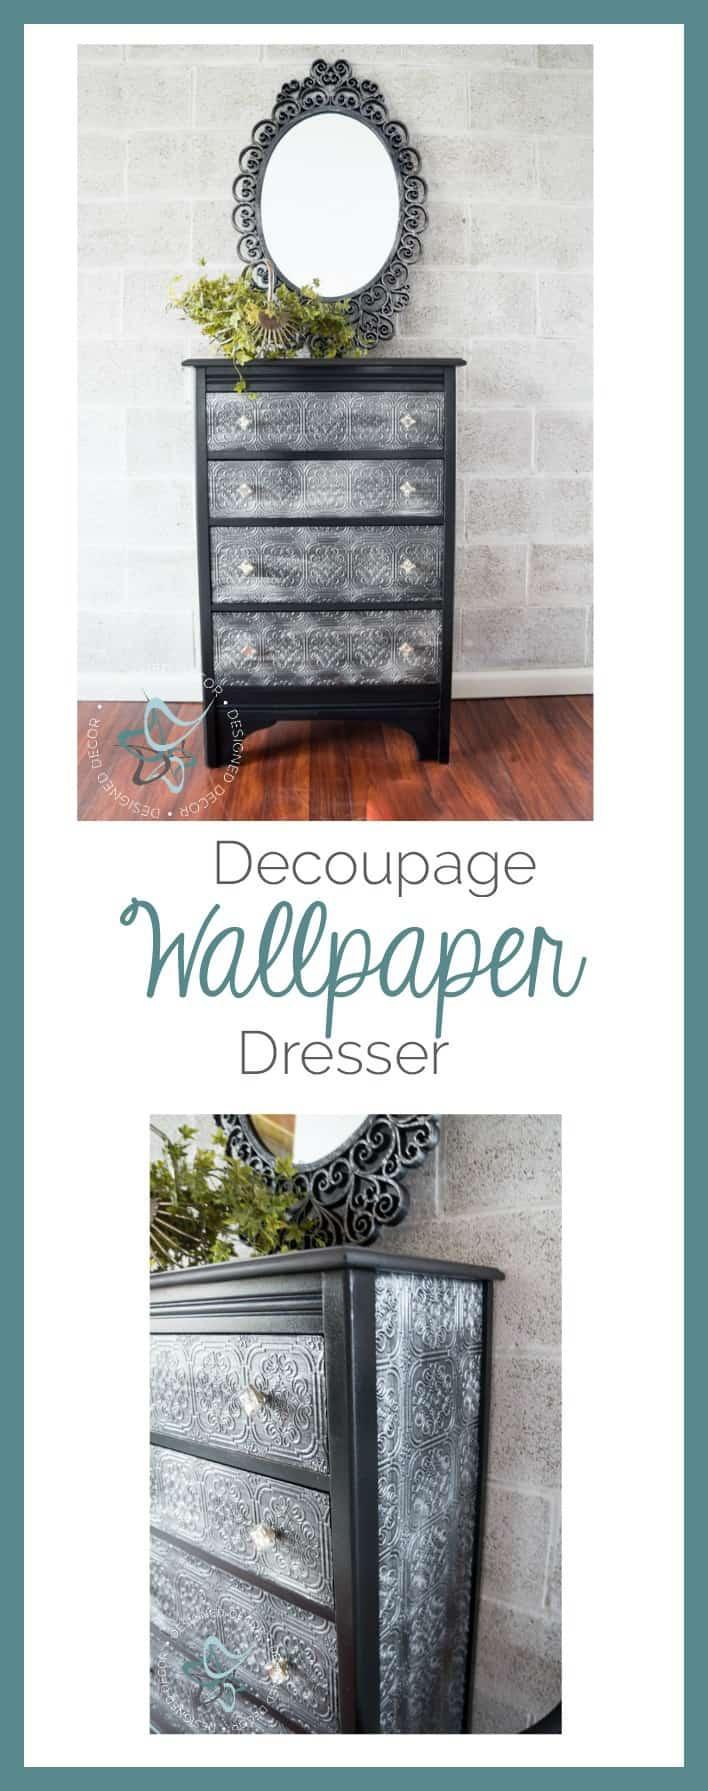 decoupage wallpaper dresser